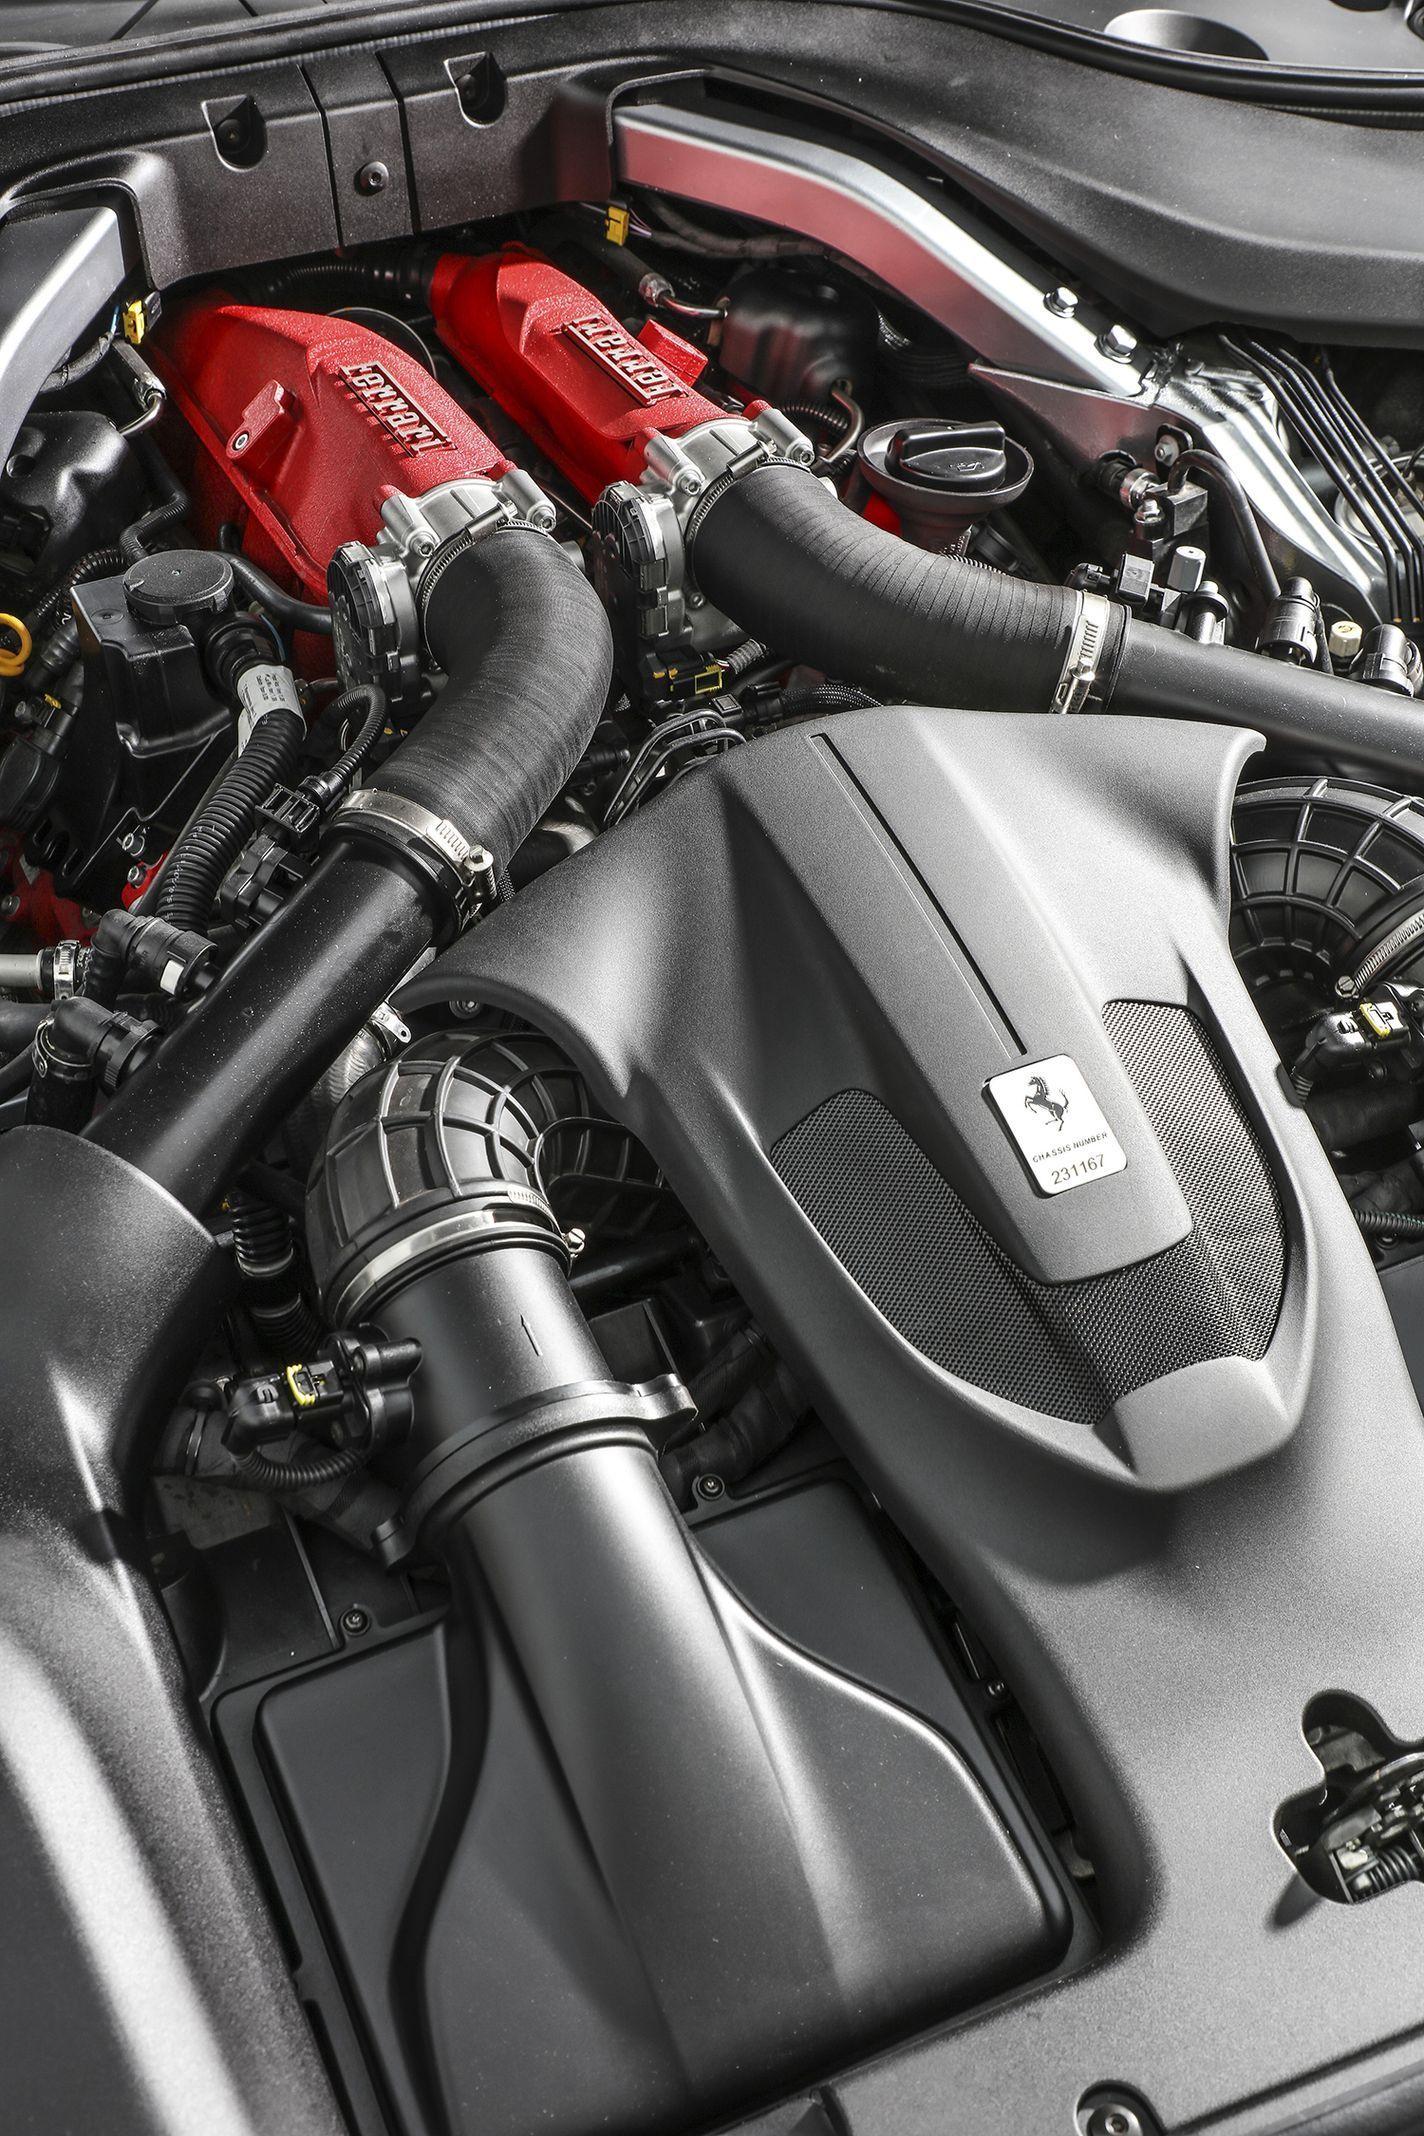 2018 Ferrari Portofino First Drive Sportscars Drive Ferrari Portofino Ferrari Ferrari Car Sports Cars Luxury